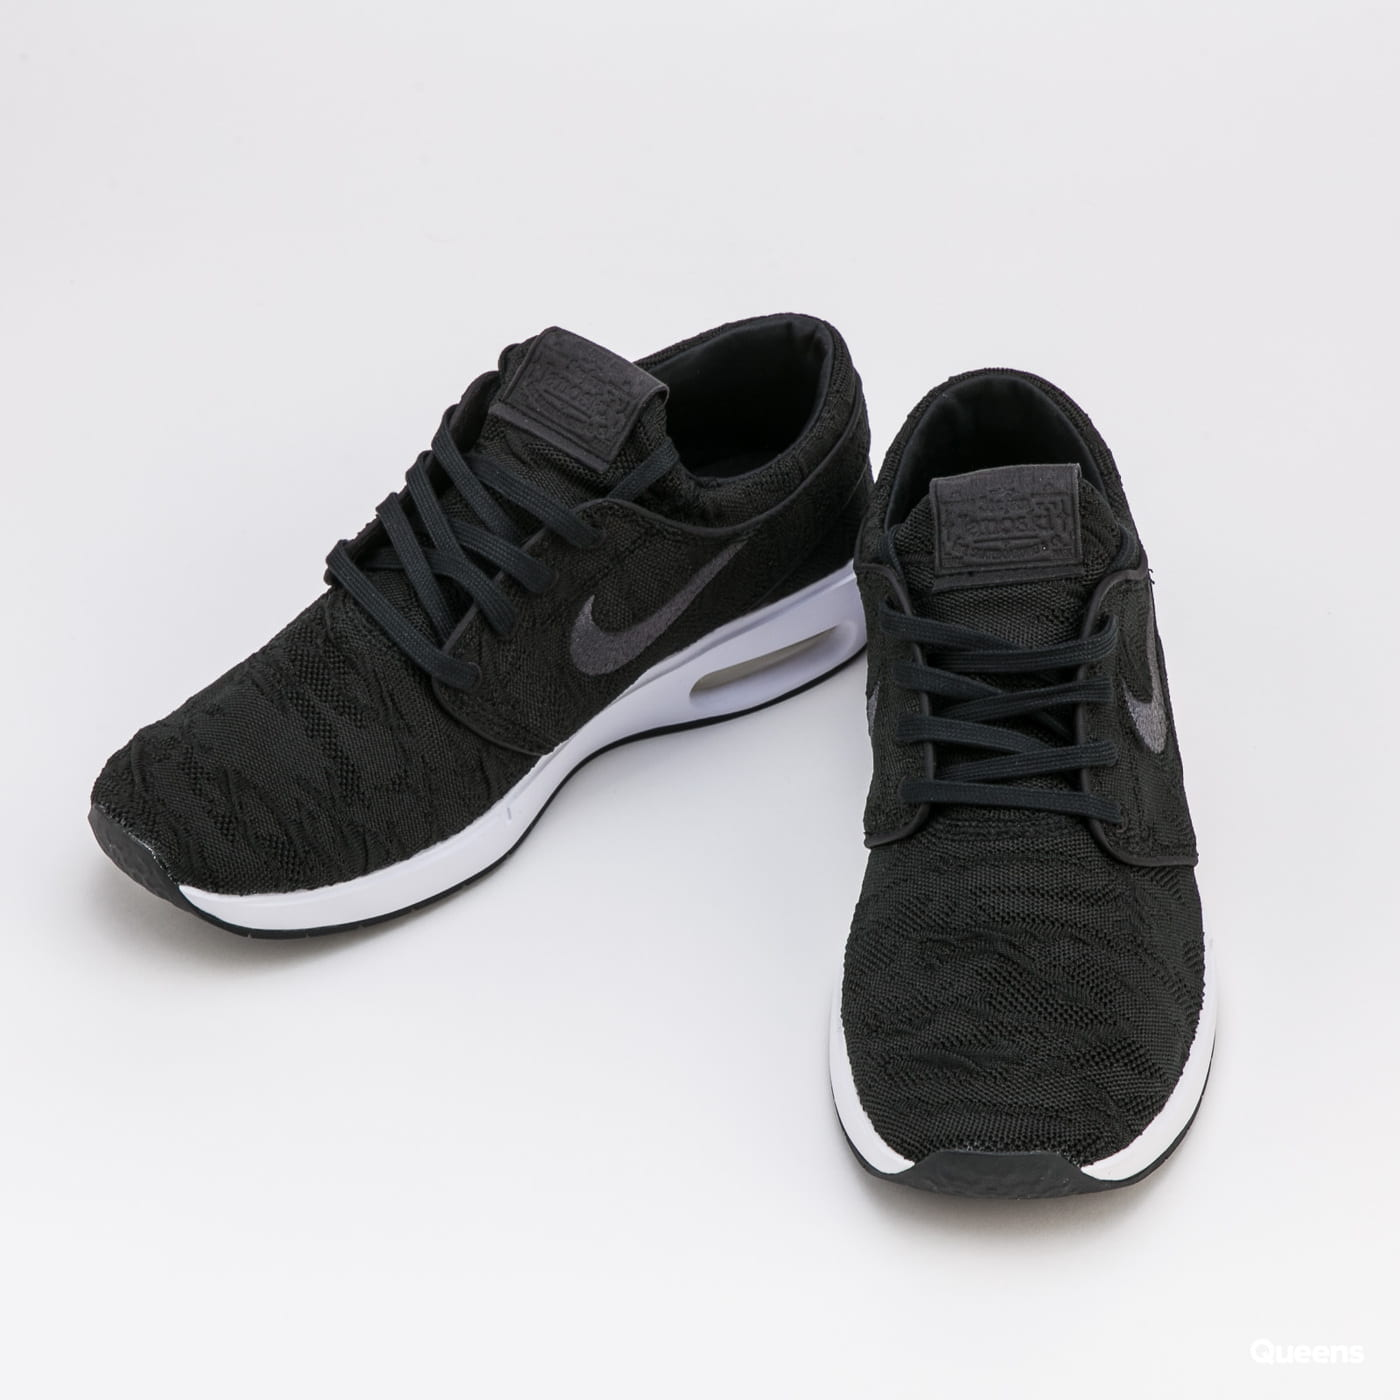 Nike SB Air Max Janoski 2 black / anthracite - white